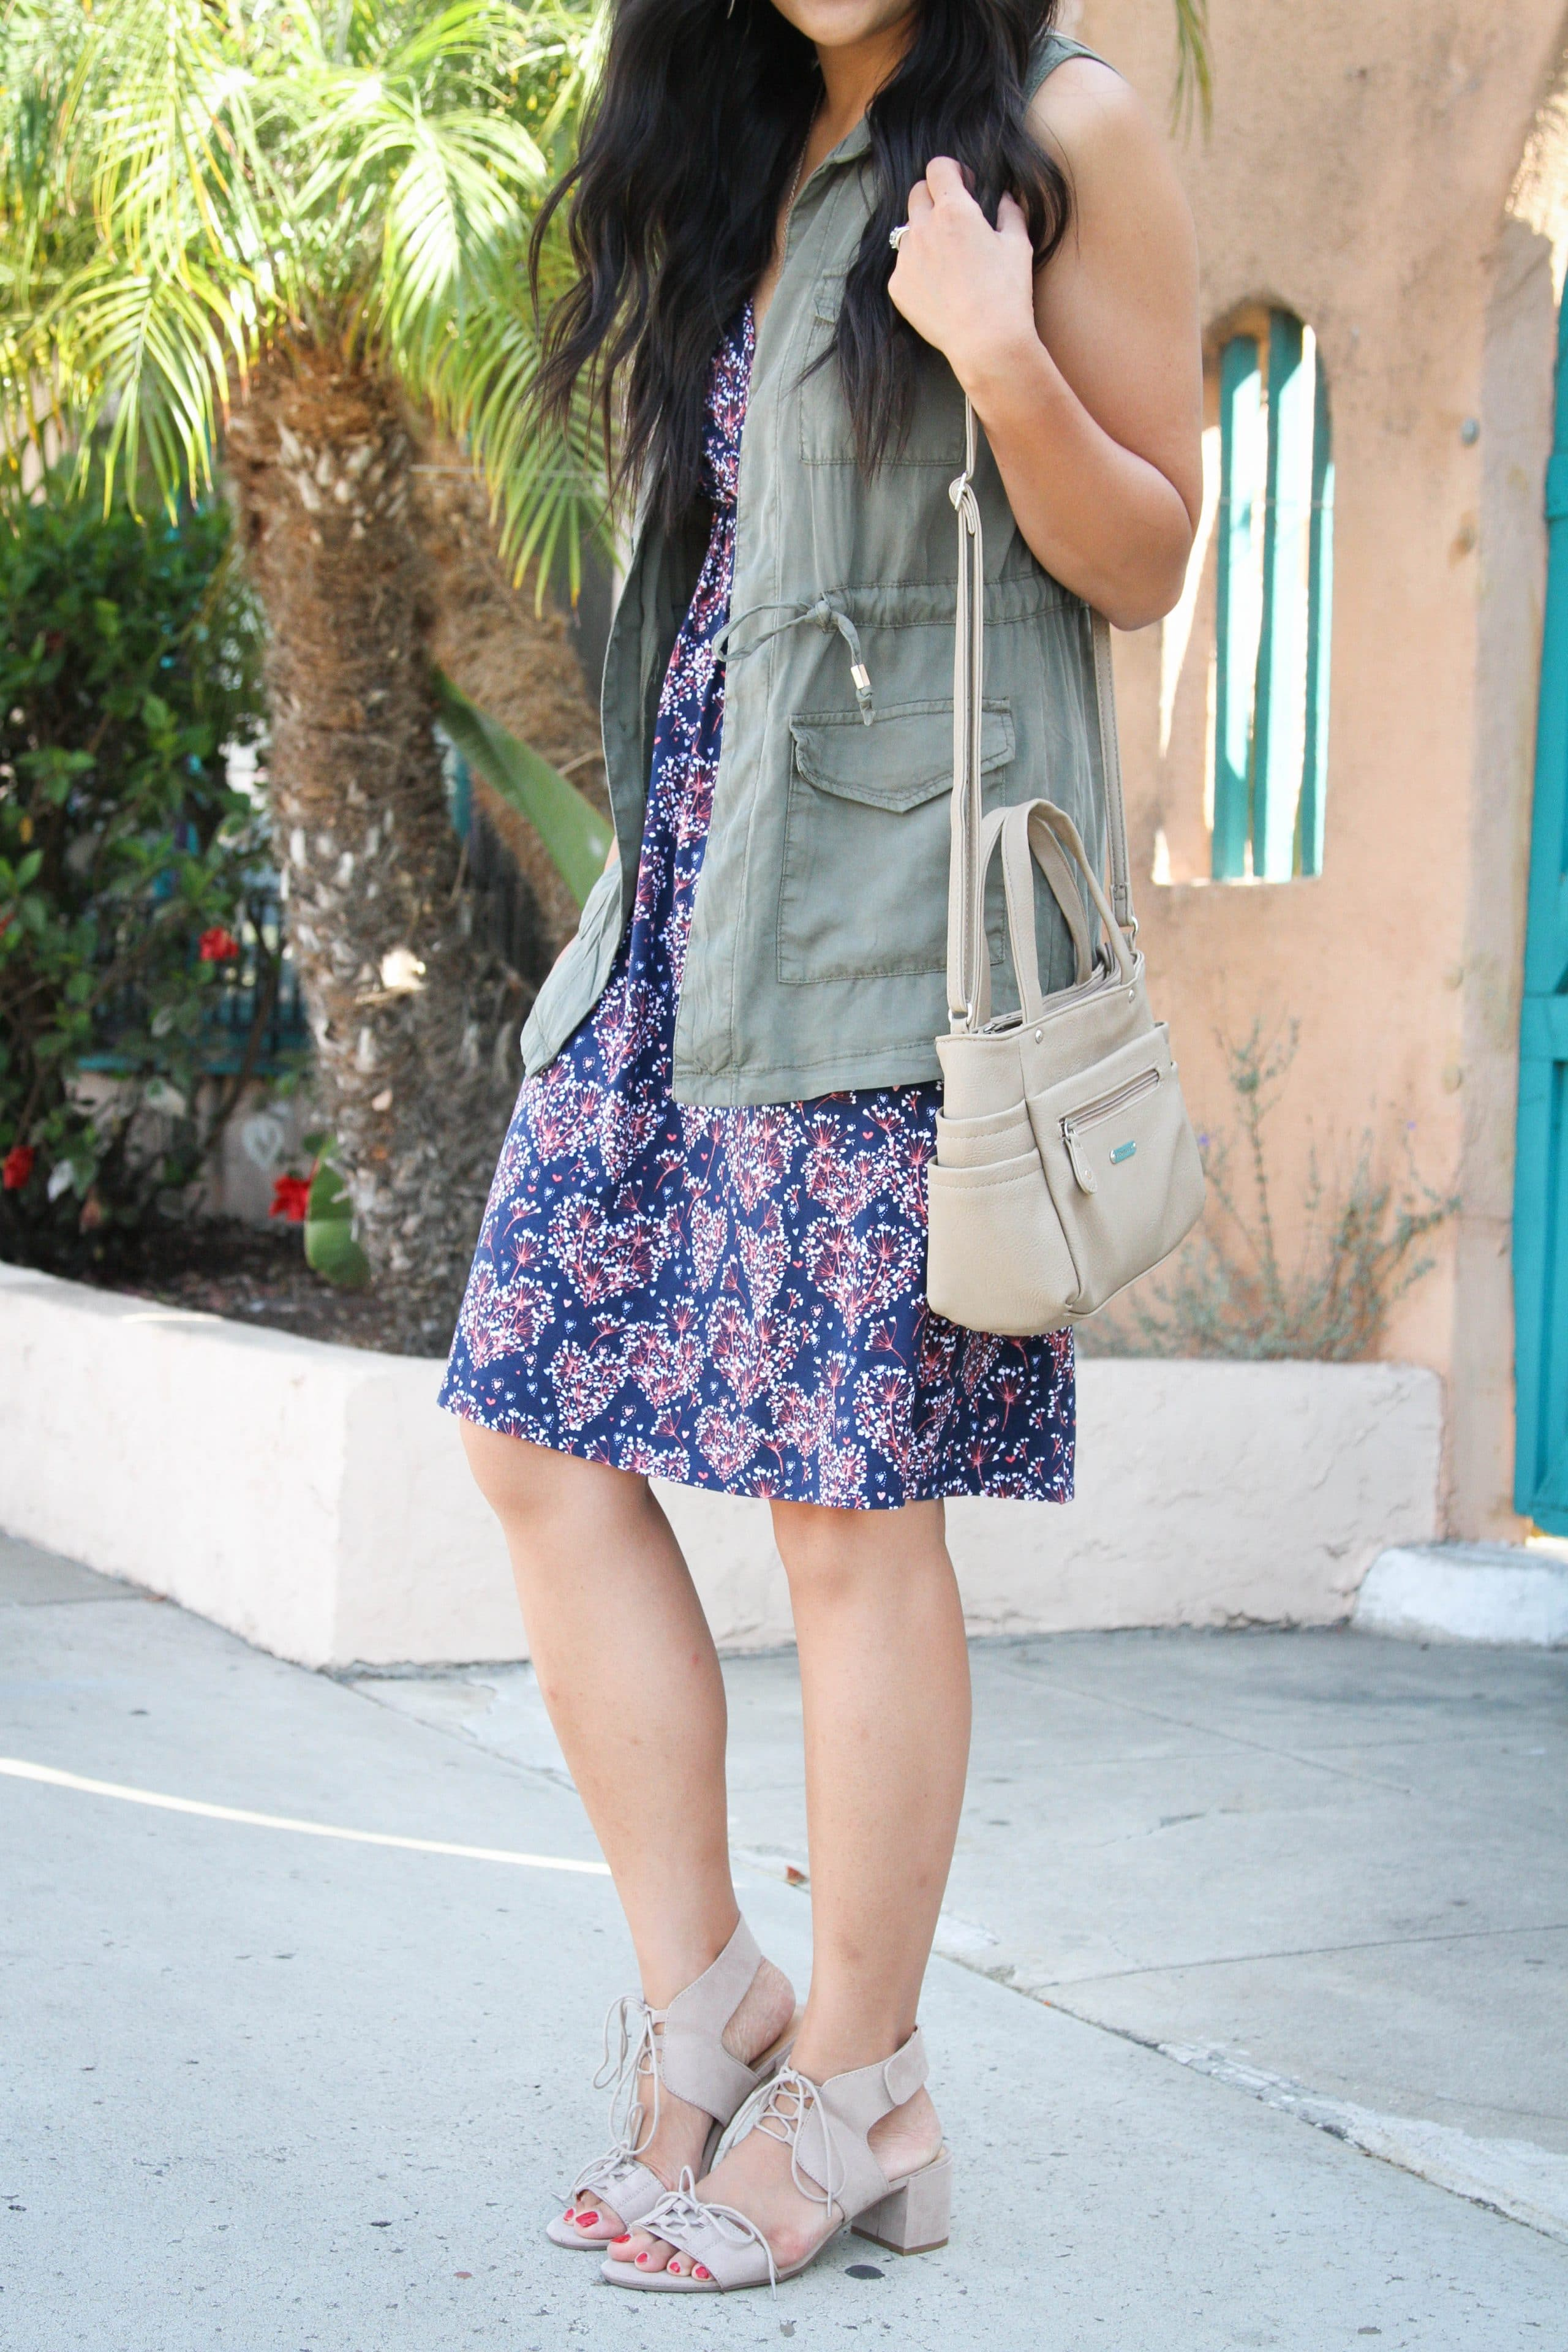 Block Sandals + Green Vest + Blue printed Dress + Tan Bag